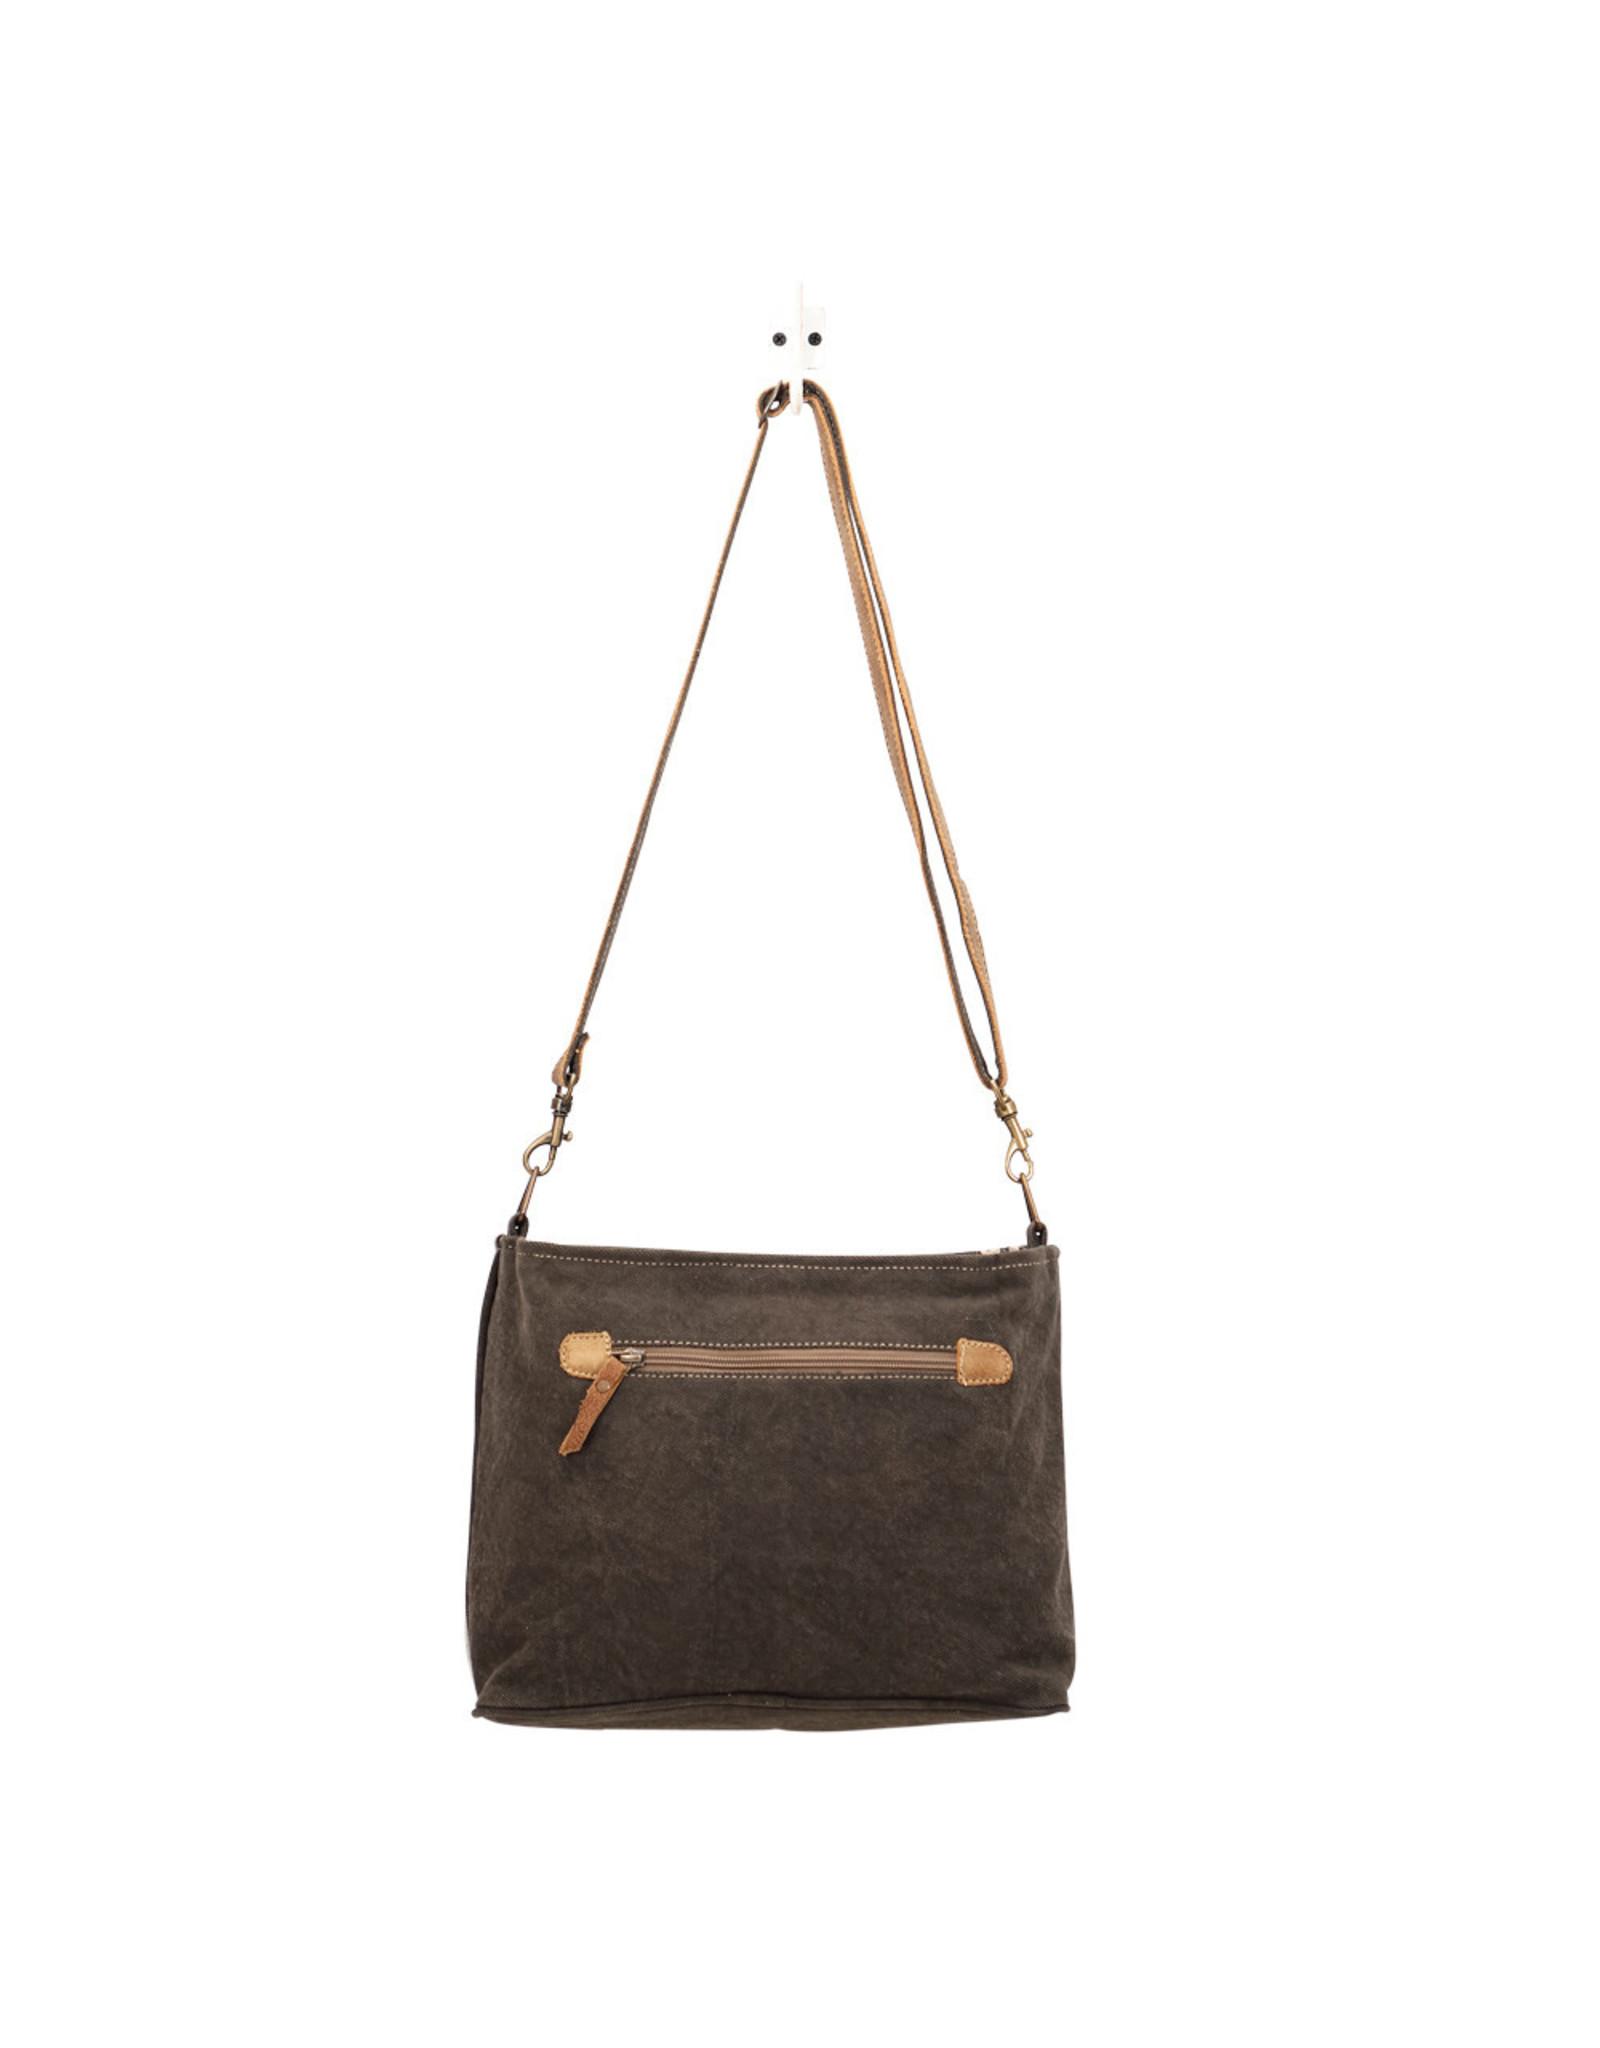 Myra Bags S-1431 Cerulean Shoulder Bag